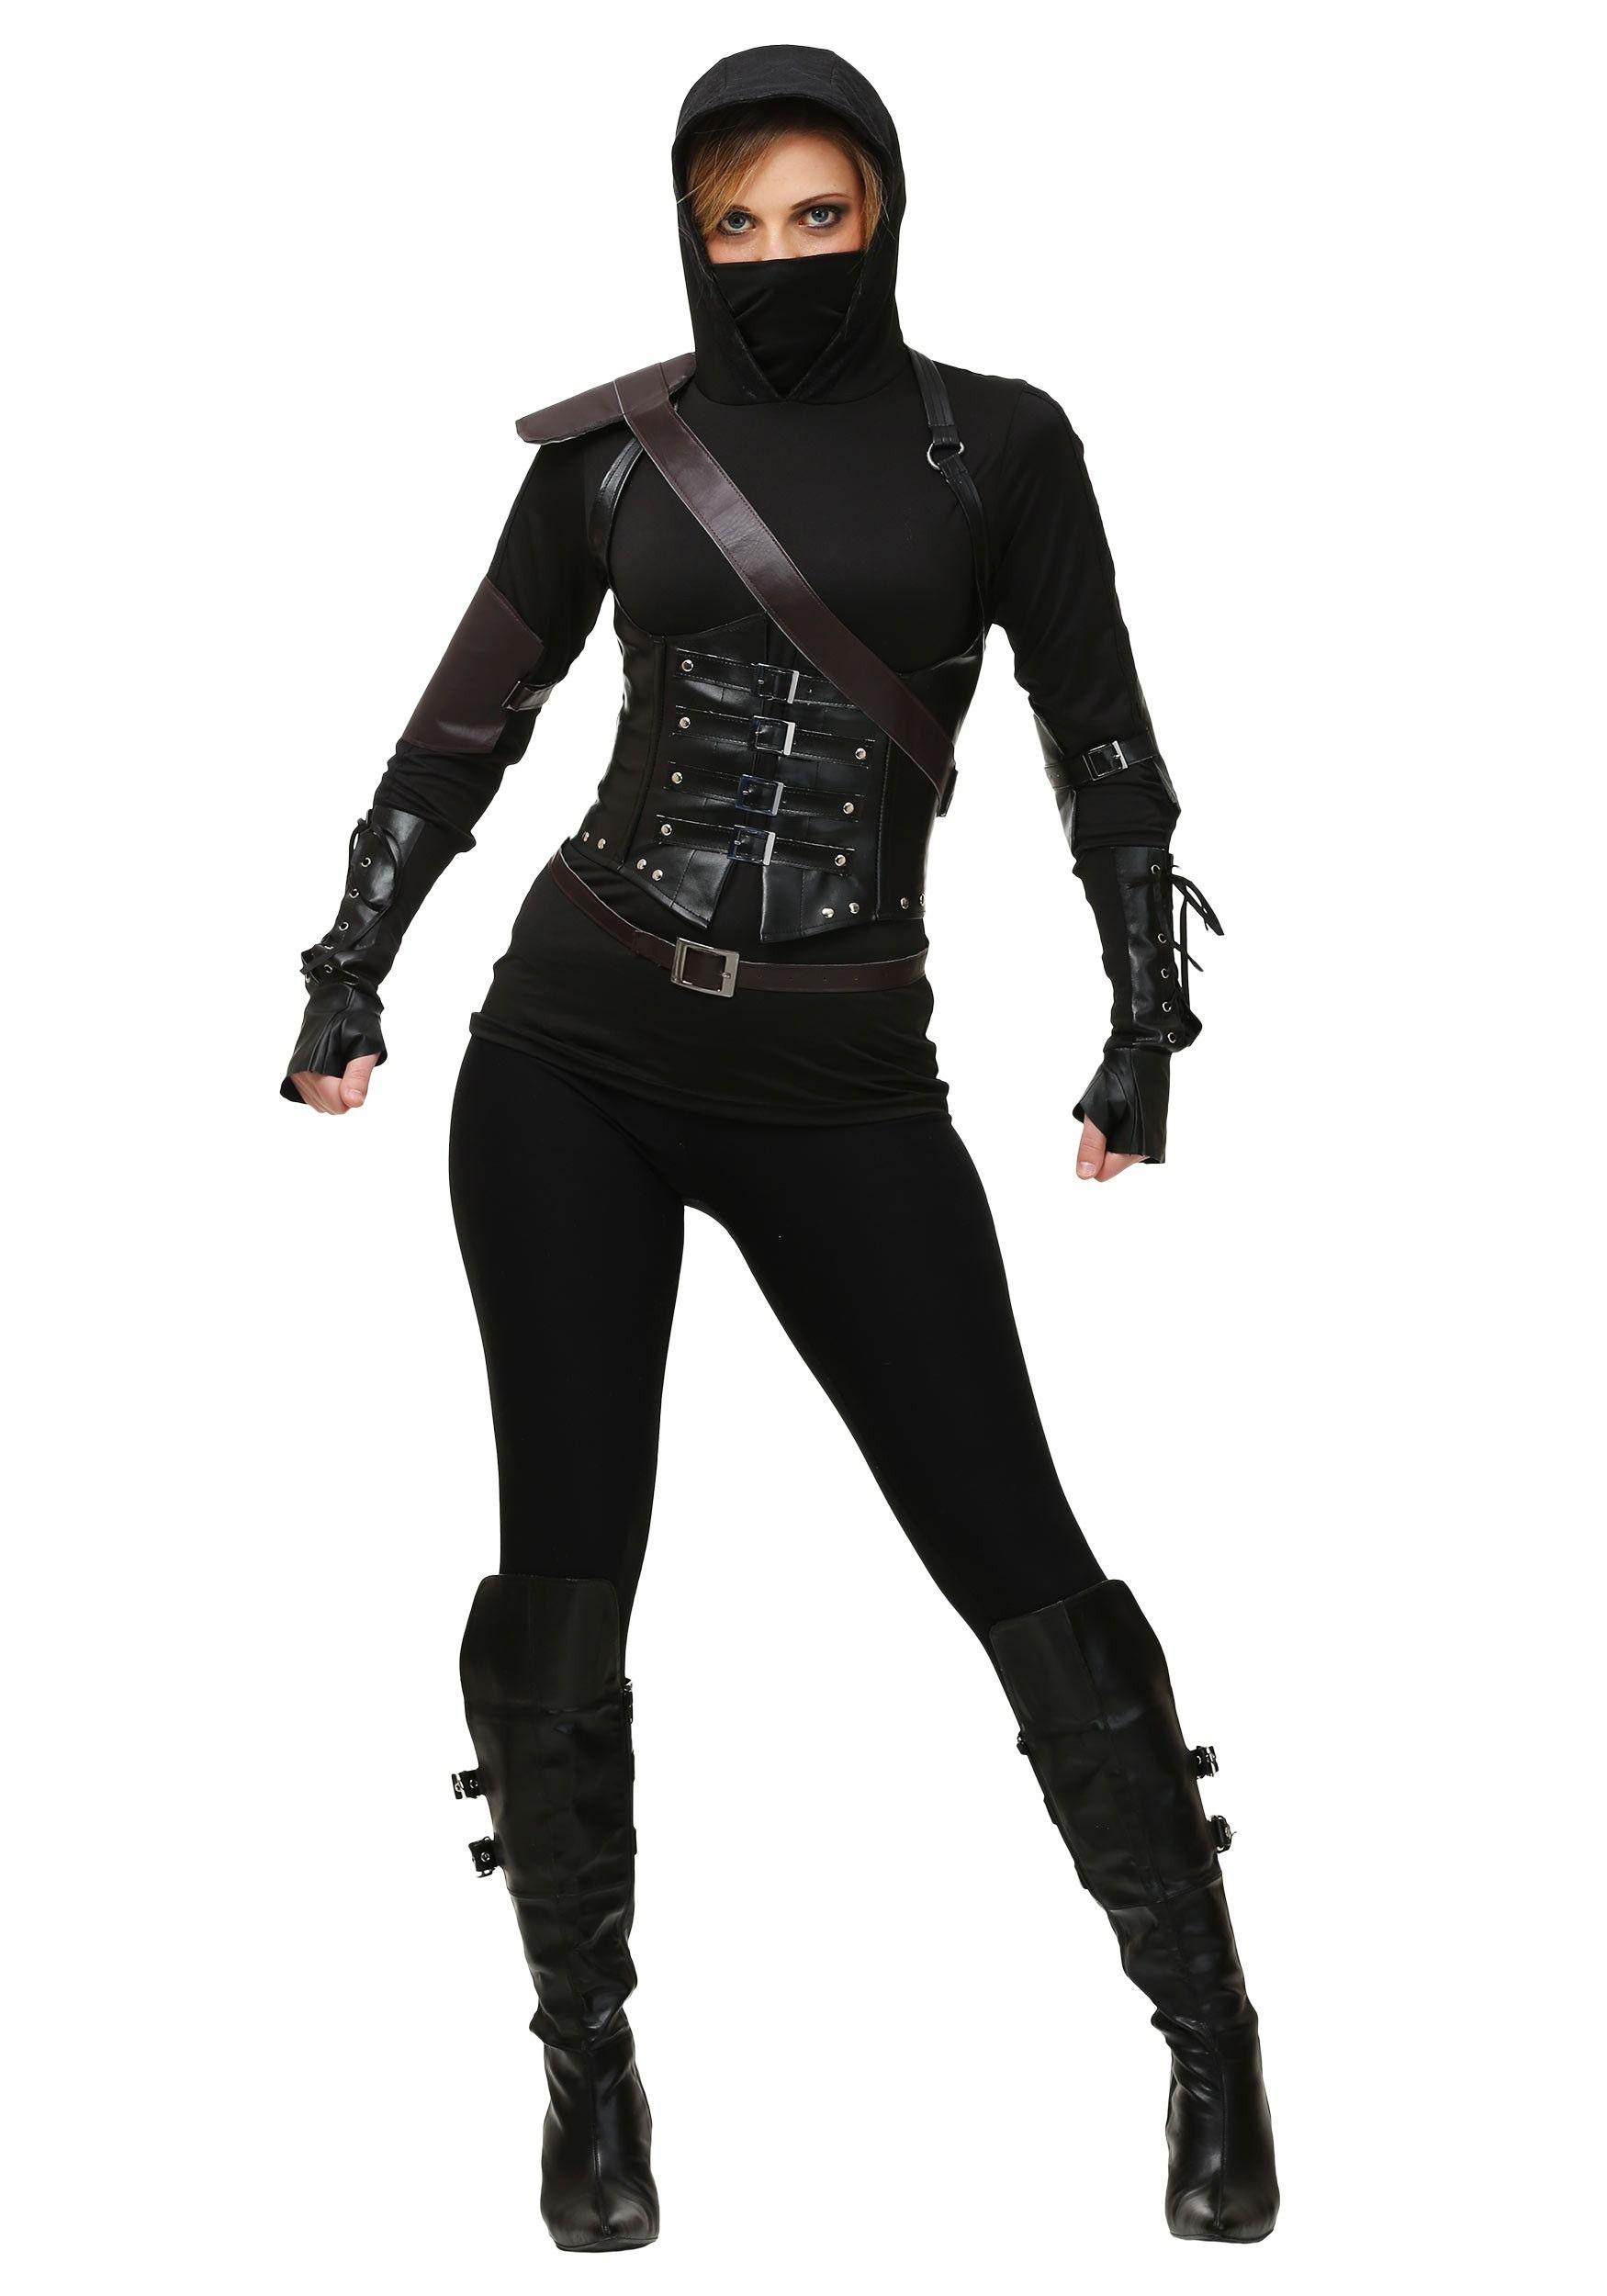 aa2ff1569 ninja assassin costume | costume ideas in 2019 | Assassin costume ...